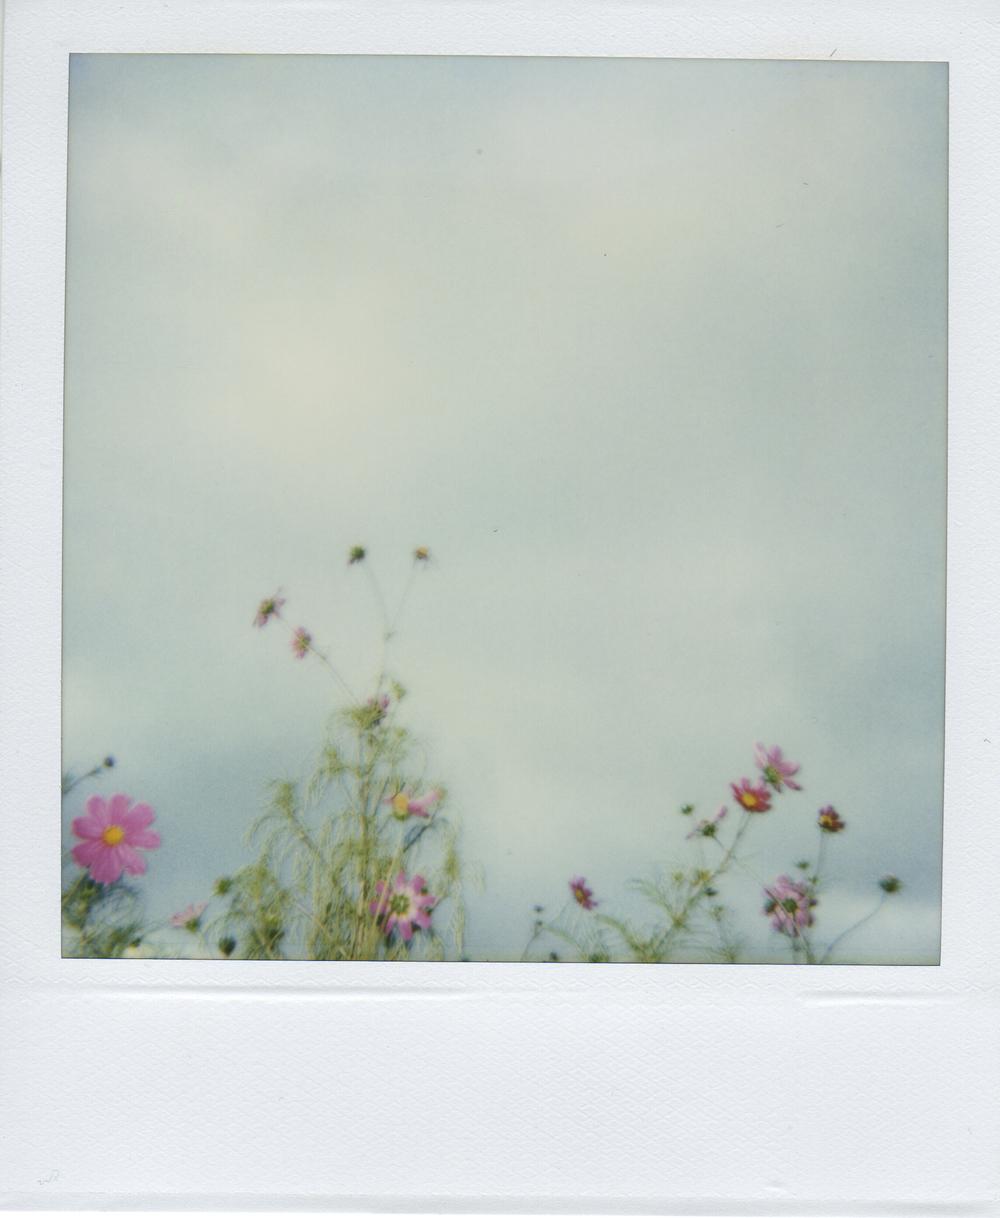 jlaurence-polaroid-137.jpg